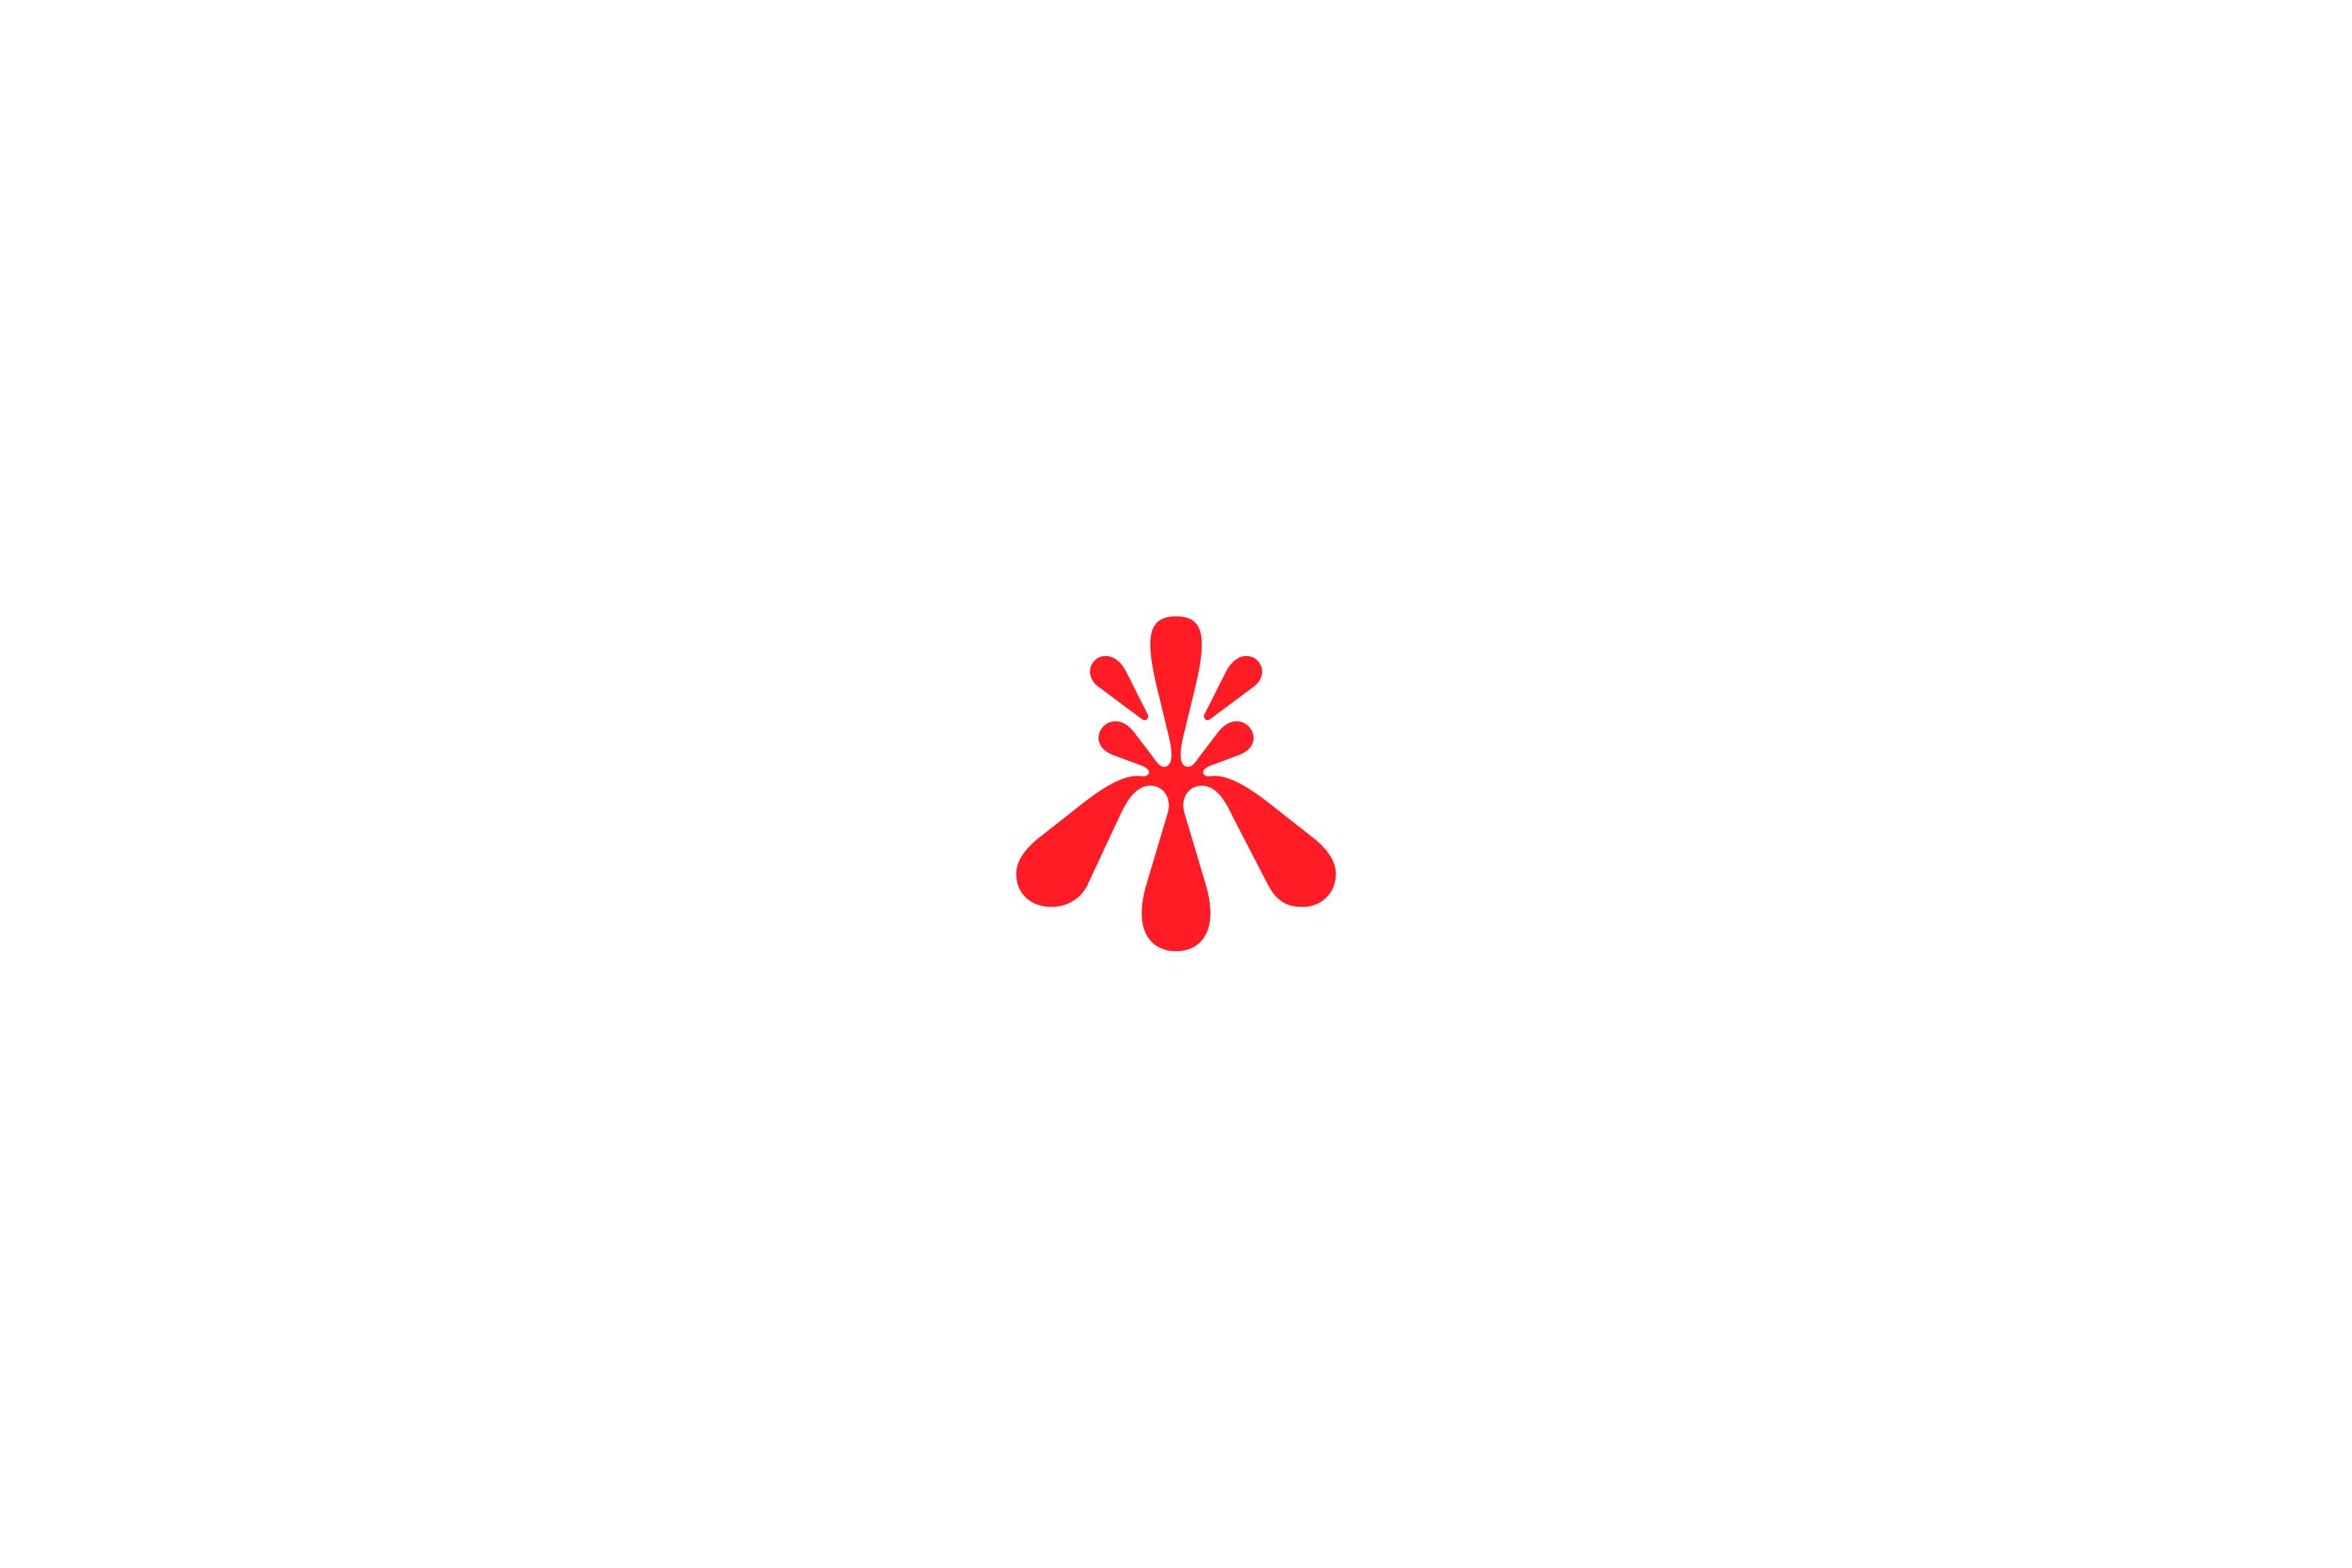 dynamo_logo_symbol_positive